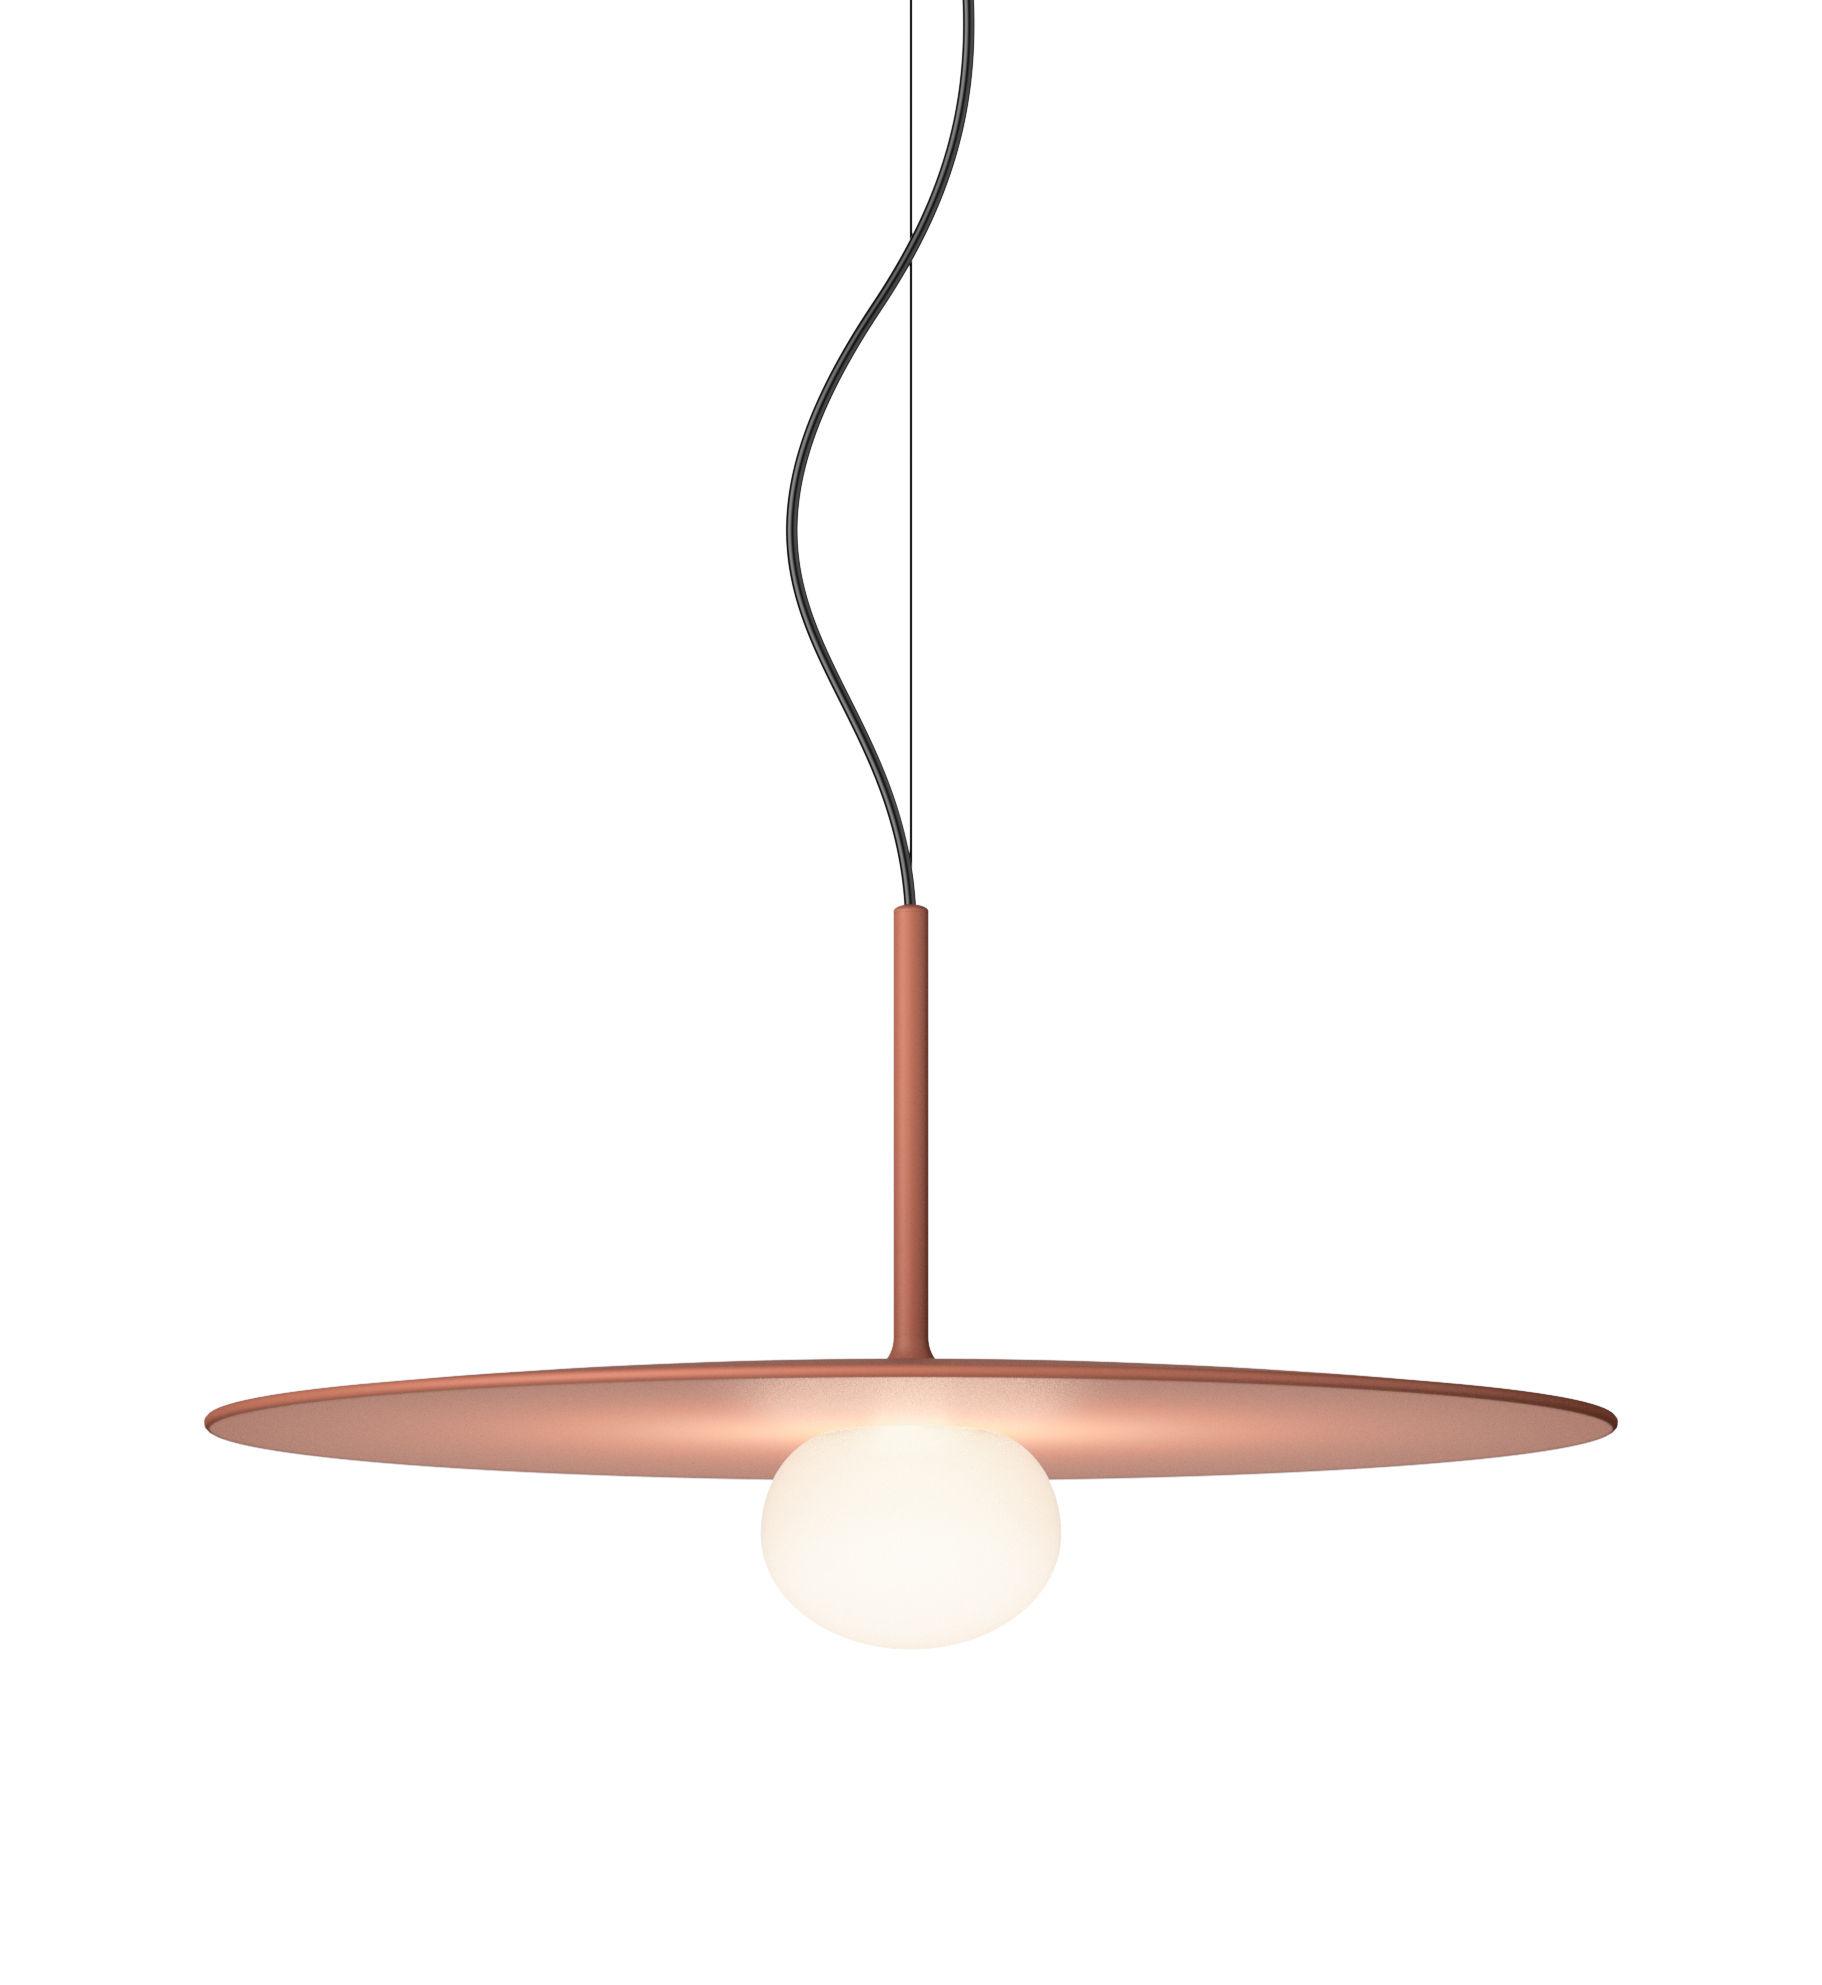 Leuchten - Pendelleuchten - Tempo Disque  Large Pendelleuchte / LED - Ø 40 cm - Vibia - Terrakotta - geblasenes Glas, lackiertes Aluminium